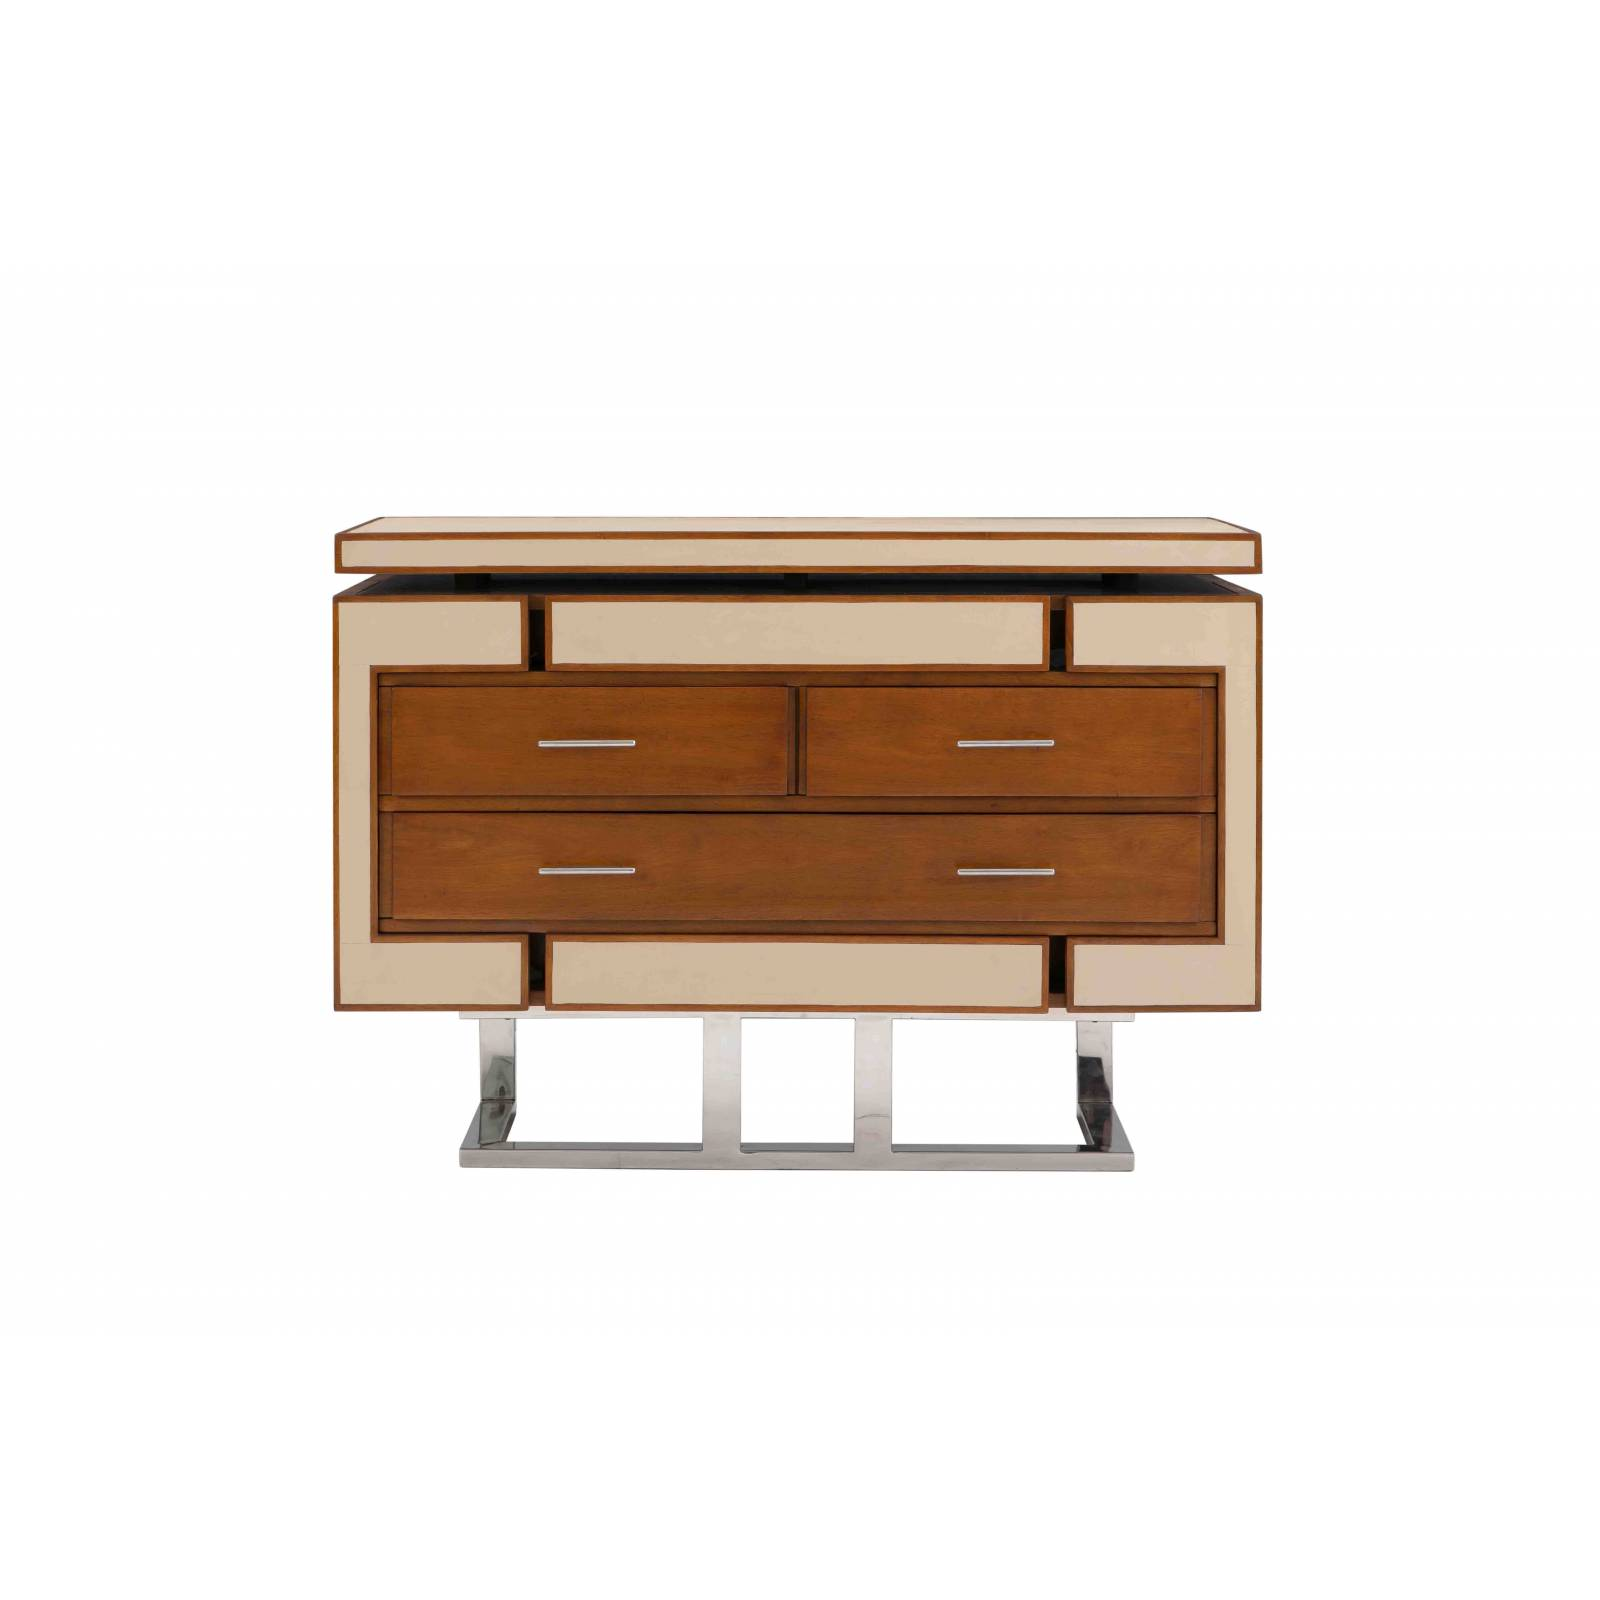 Commode AZUR, cuir beige Mobilier Club Vintage - 5